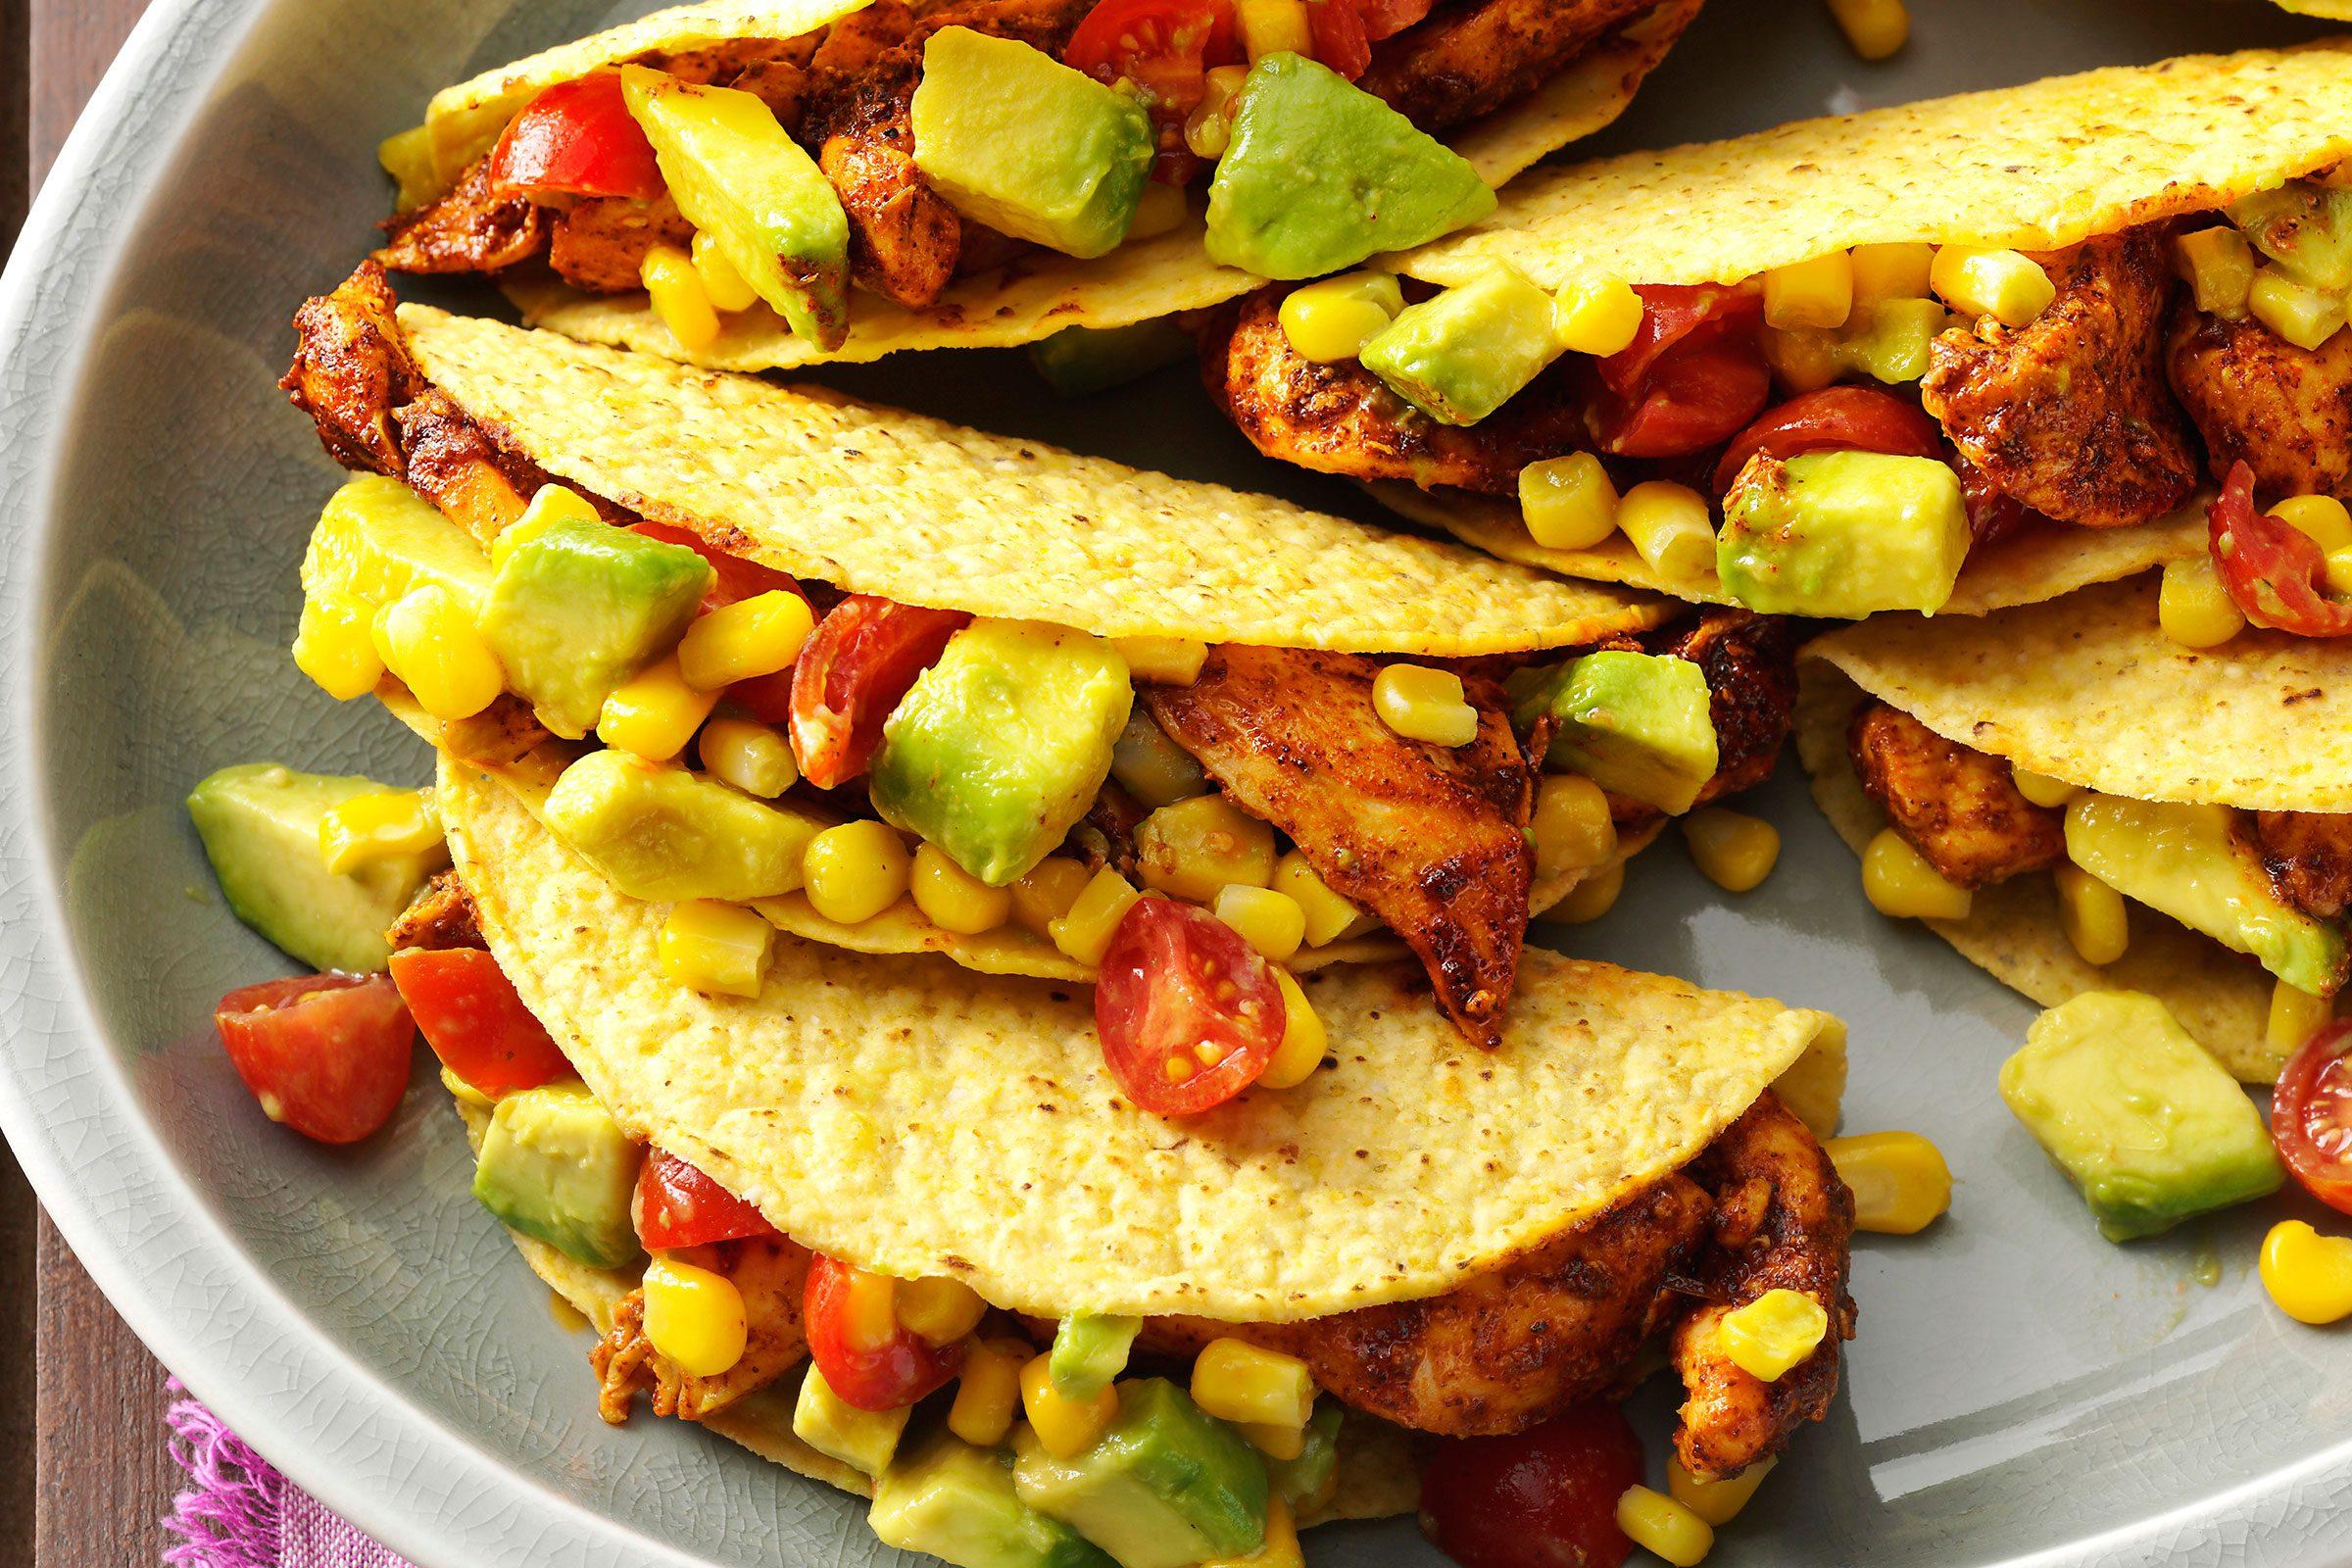 taco tuesday Chicken Tacos with Avocado Salsa